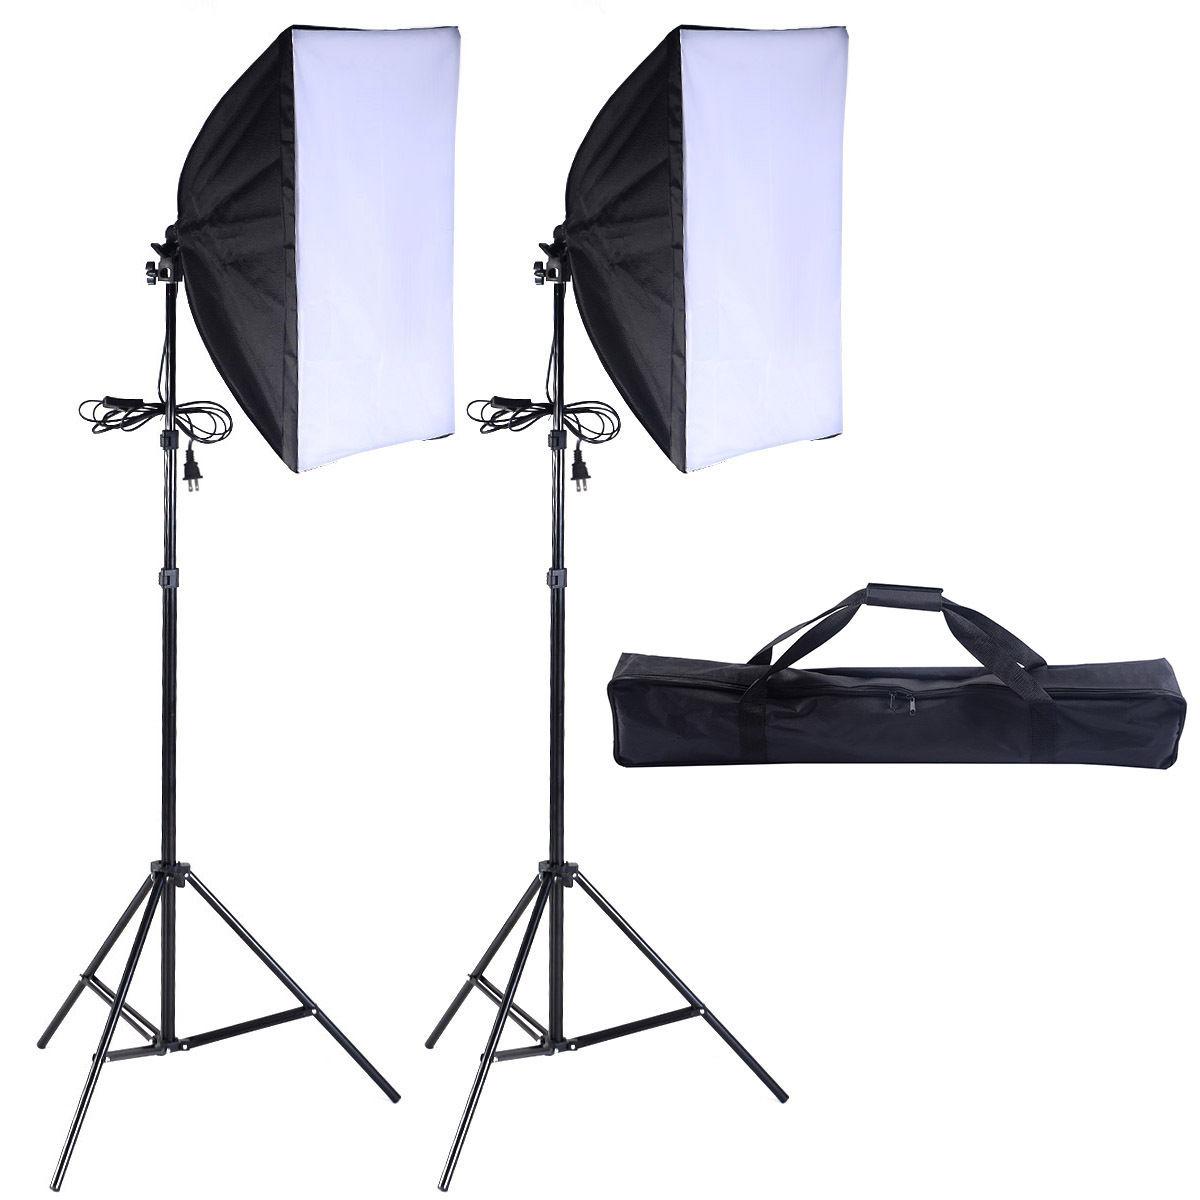 2 PCS Lighting Softbox Stand Photography Equipment Light Kit